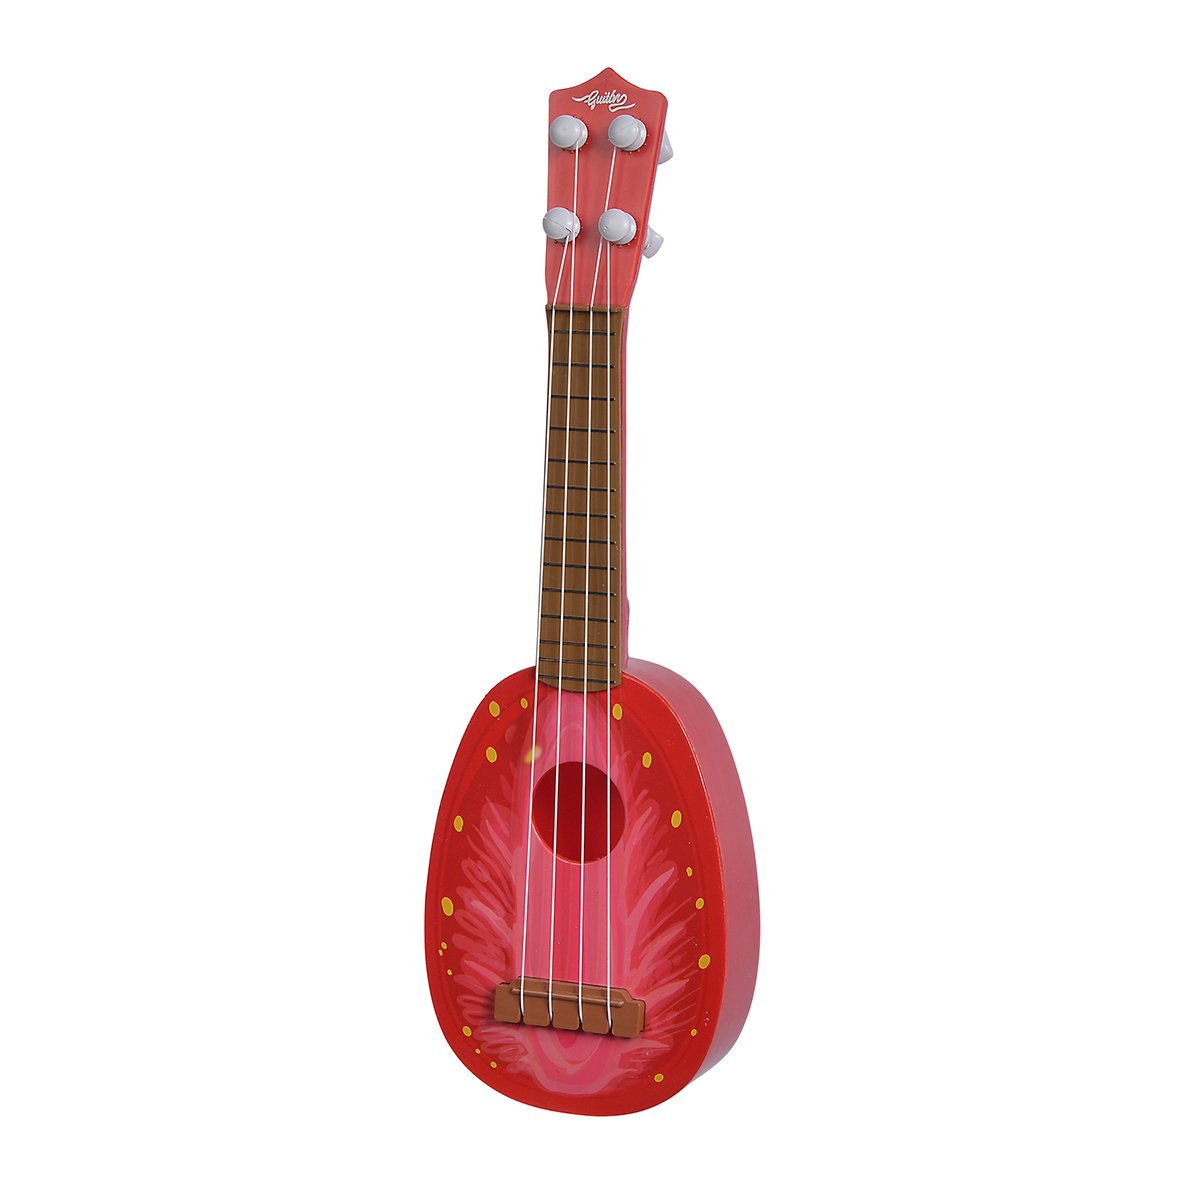 Ukulele, intstrument muzical, My Music World, Capsuna